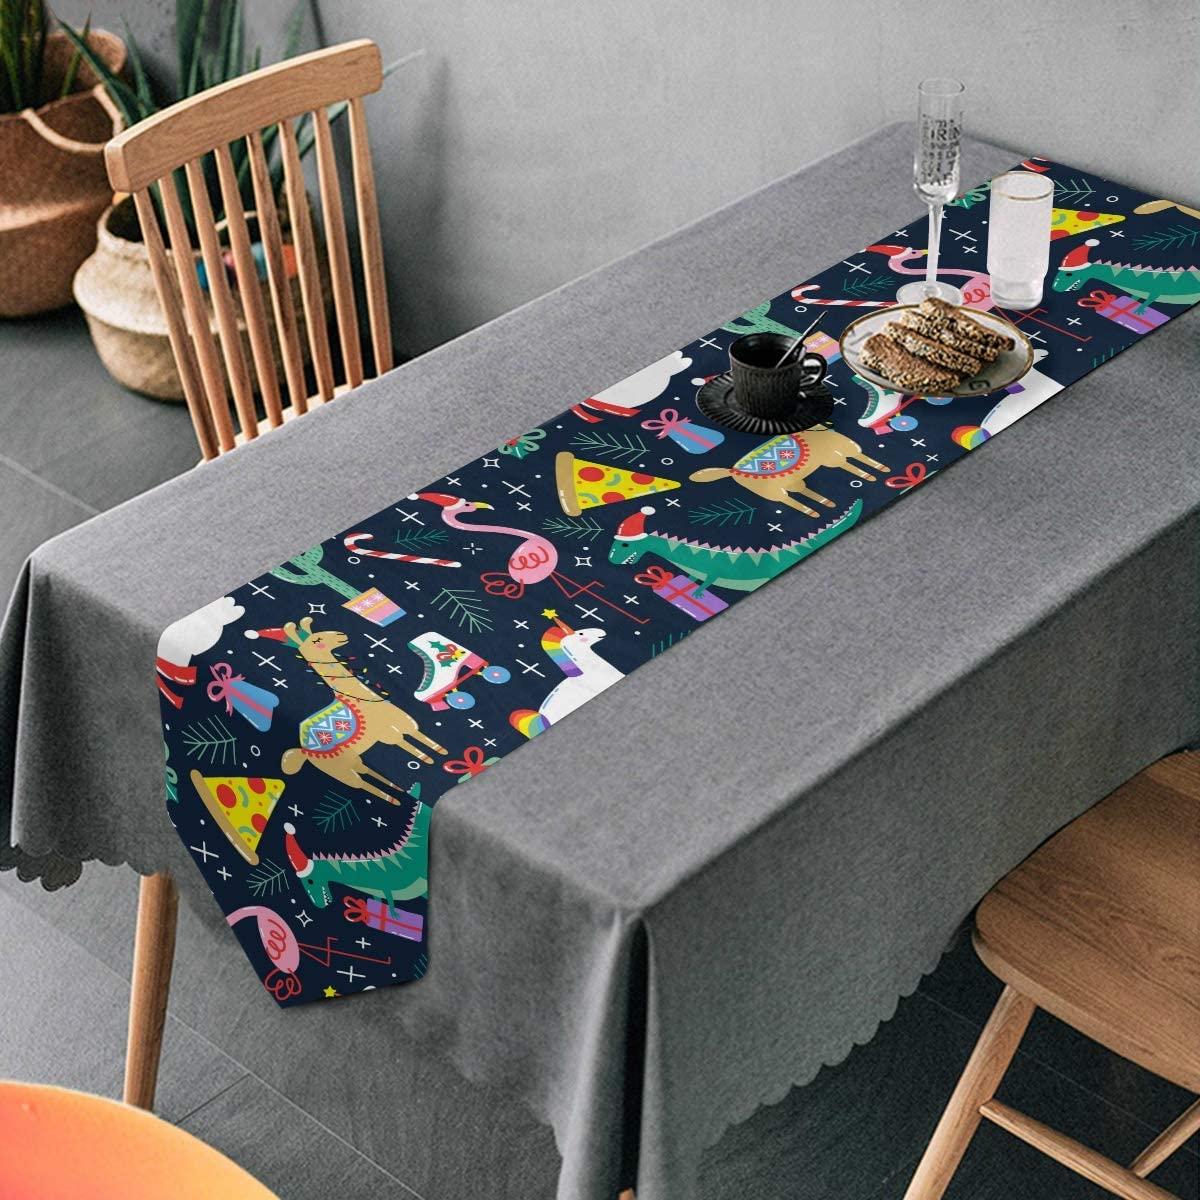 Aflyko Christmas Reindeer Dino Unicorn Table Runner Dining Table Decor 13